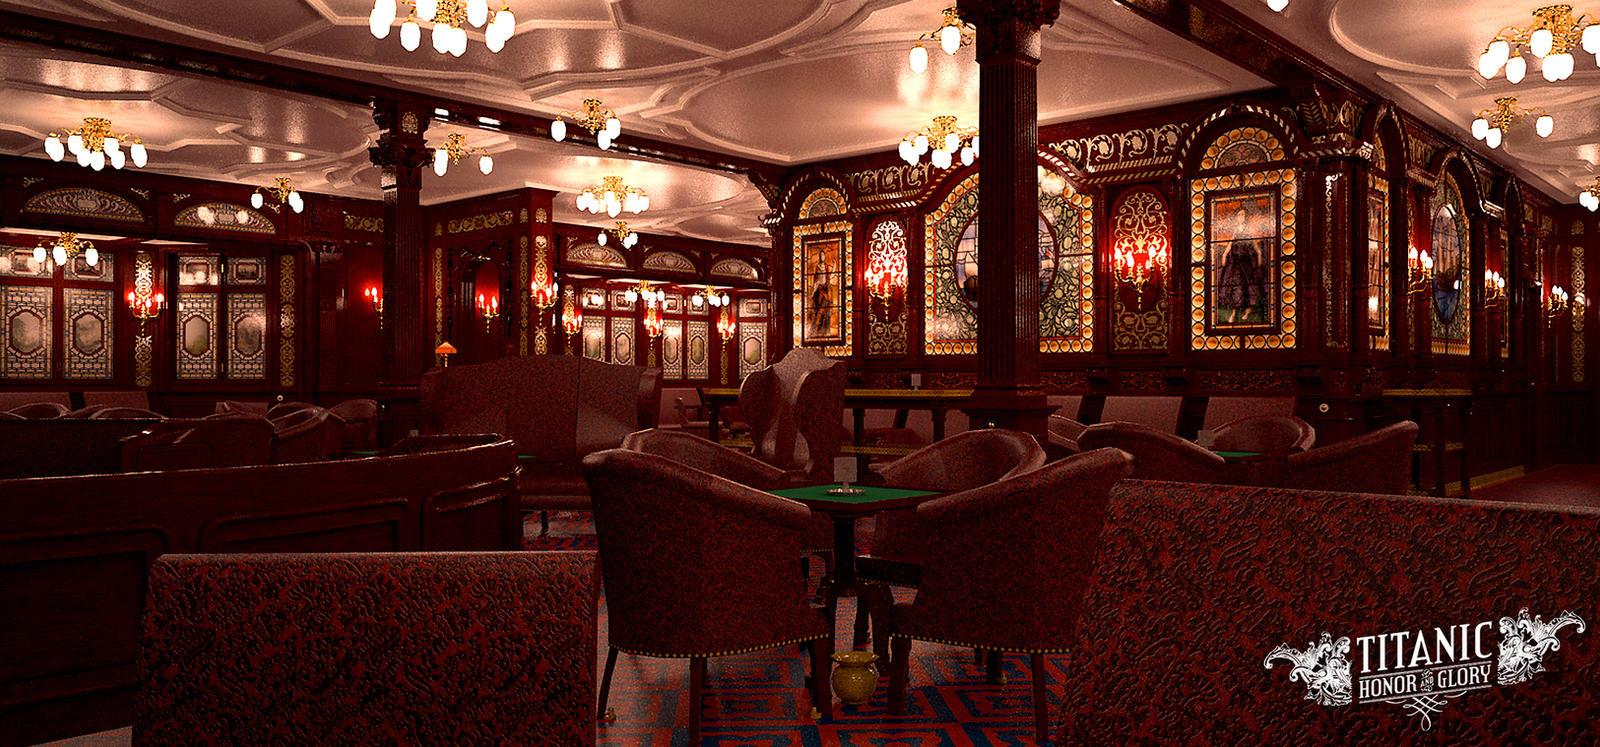 Titanic 39 S First Class Smoke Room 3 By